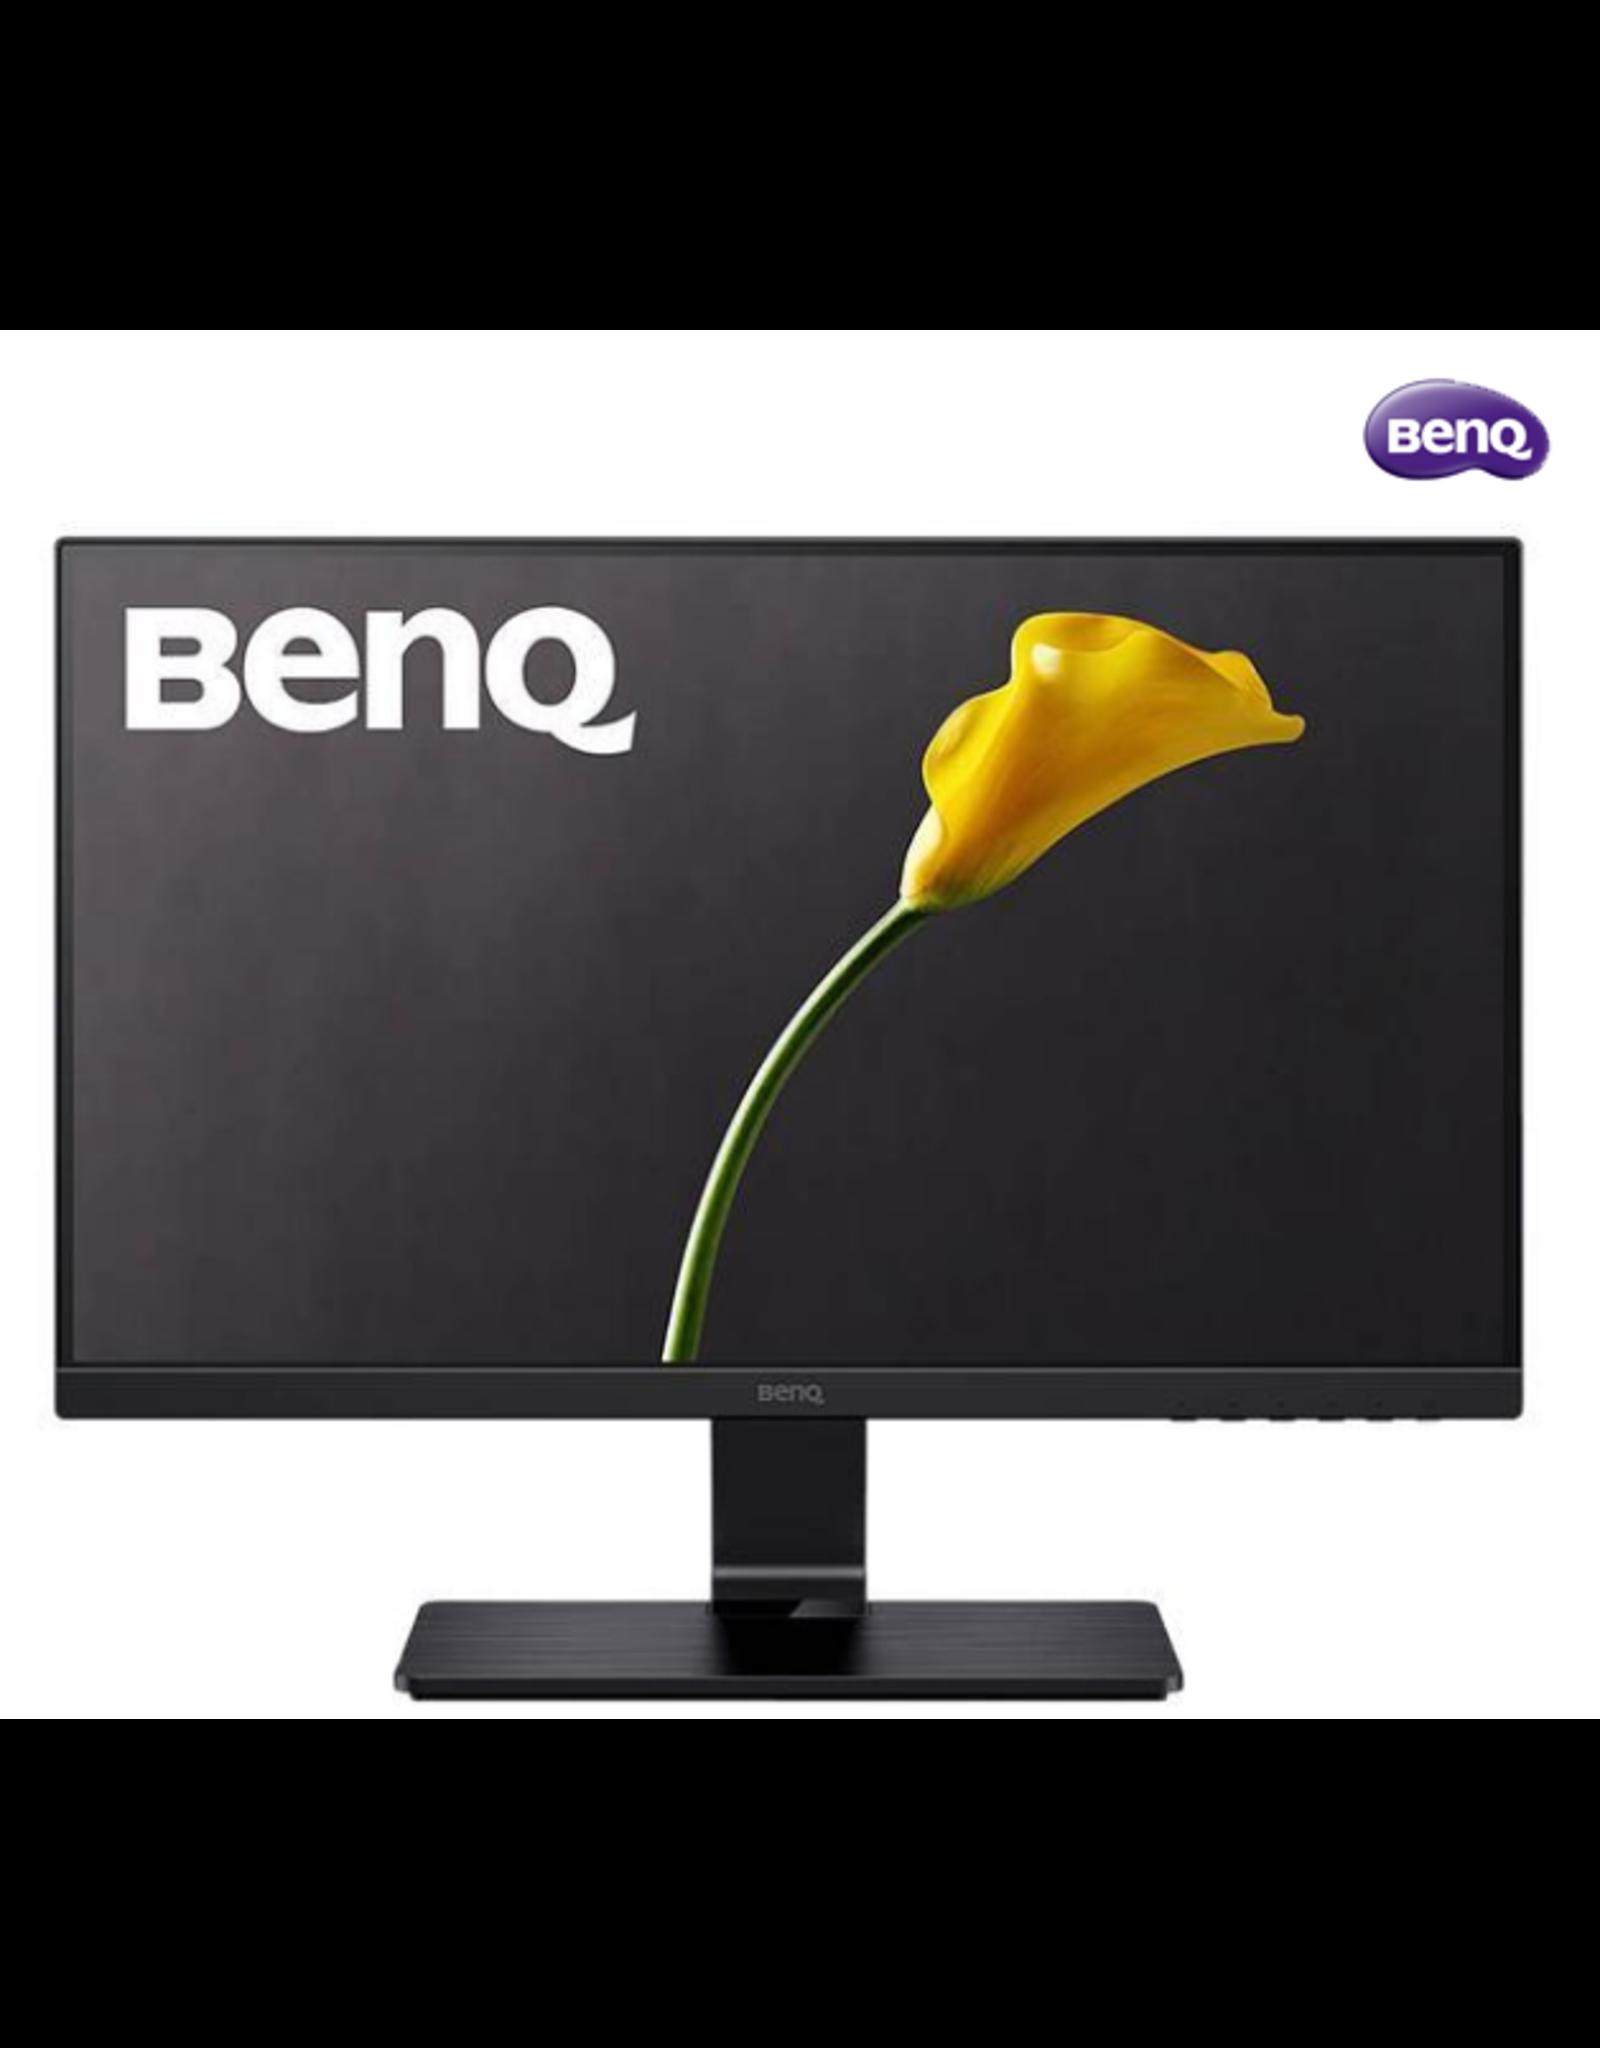 "BenQ BenQ GW2475H 24"" (Actual size 23.8"") Full HD 1920 x 1080 60 Hz D-Sub, 2 x HDMI Stylish IPS Monitor with Eye-care Technology"